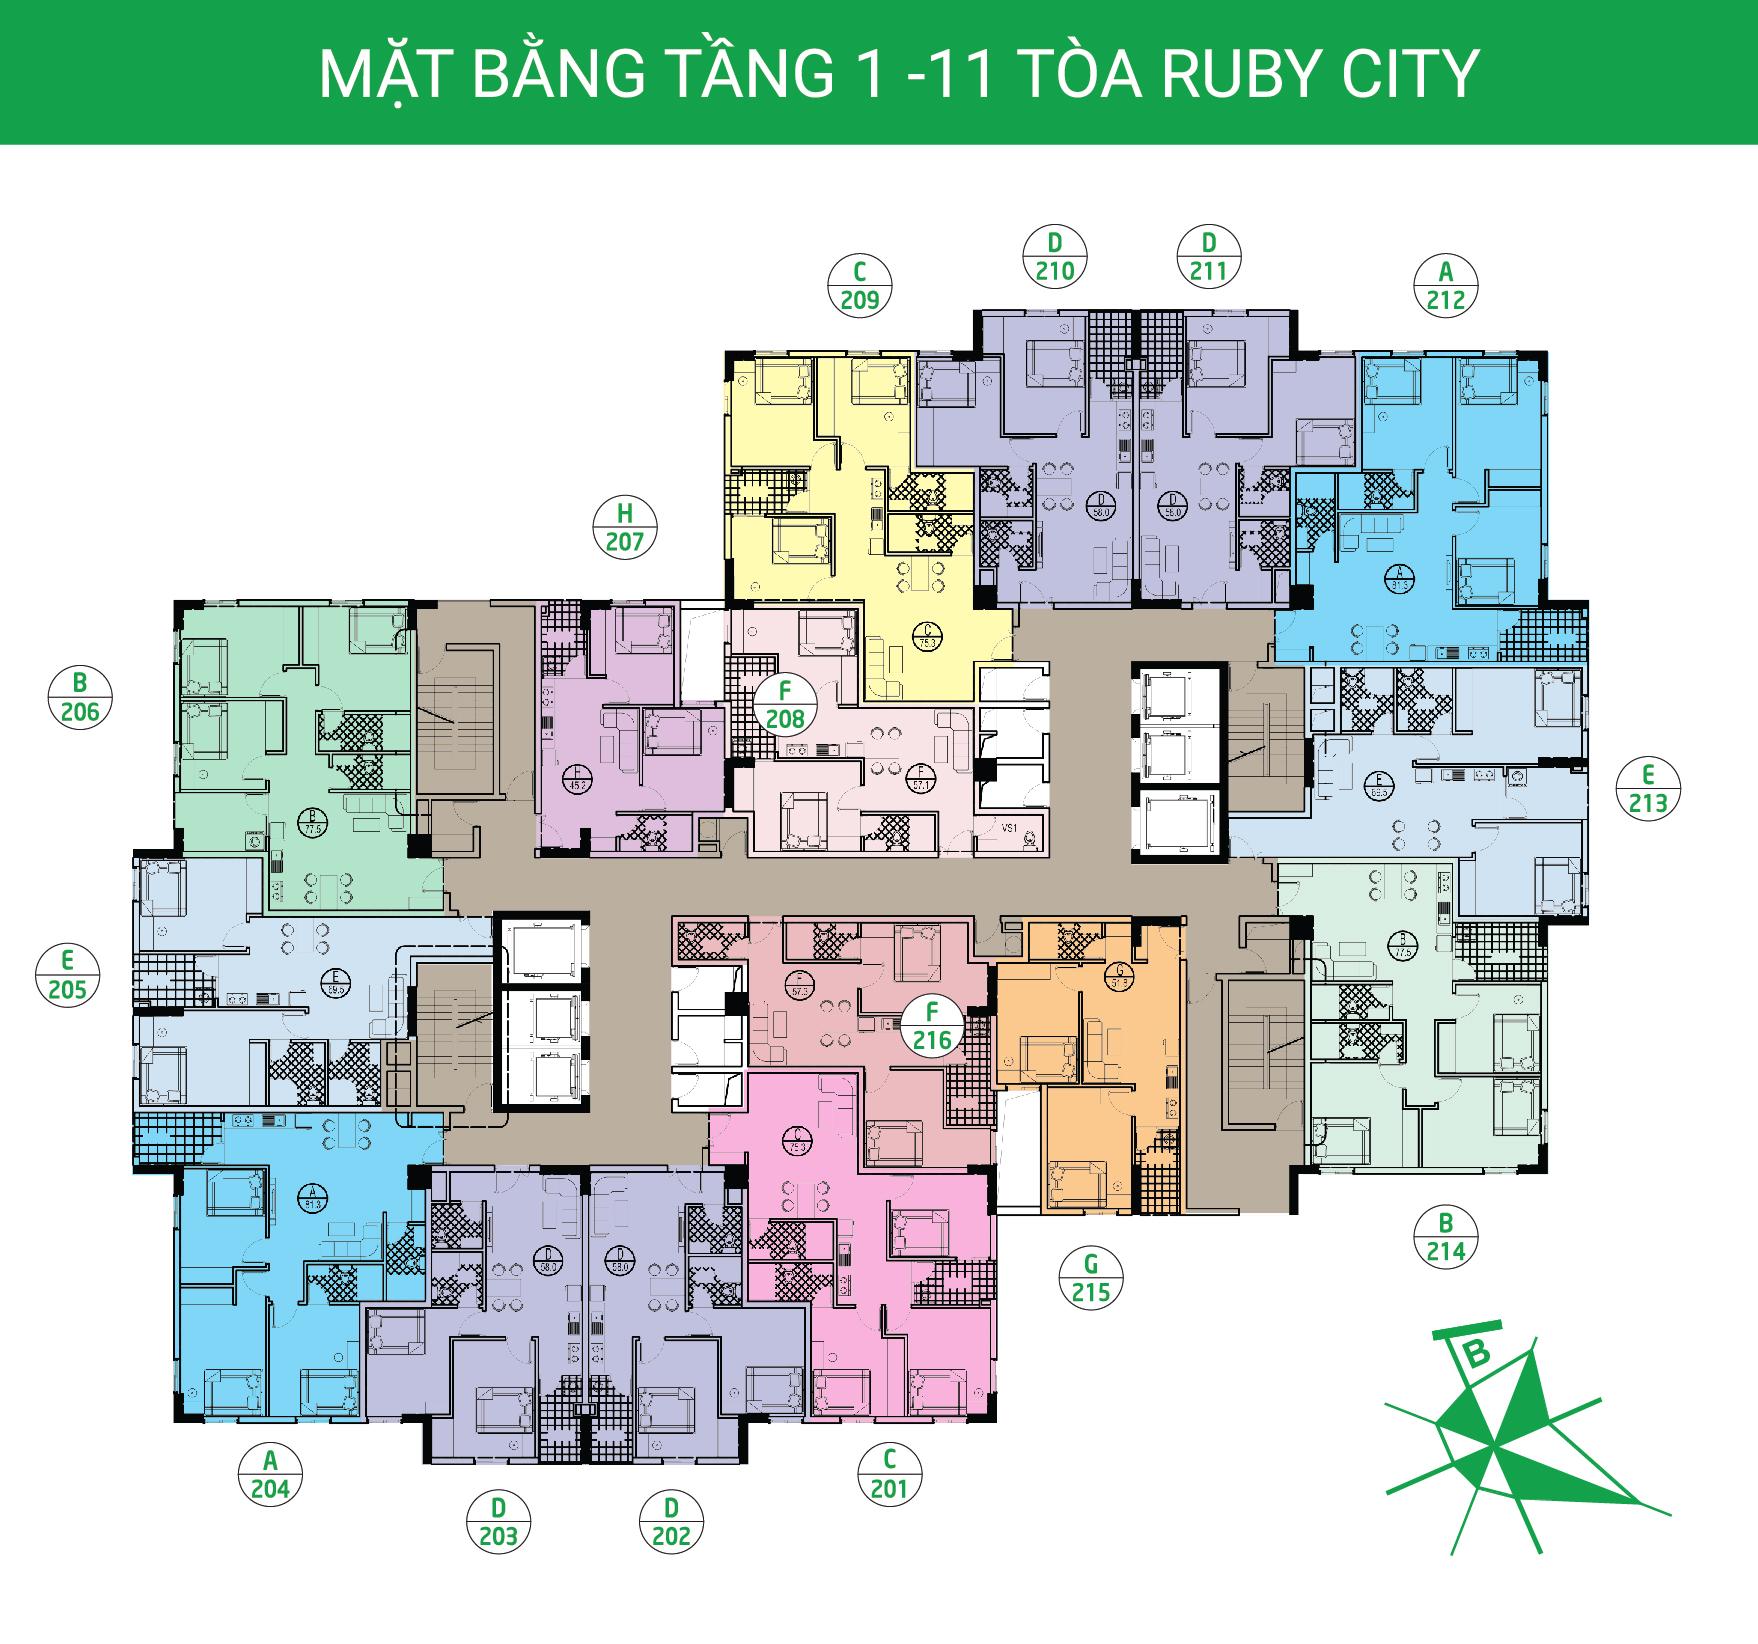 matbangtang1-11-rubyct2